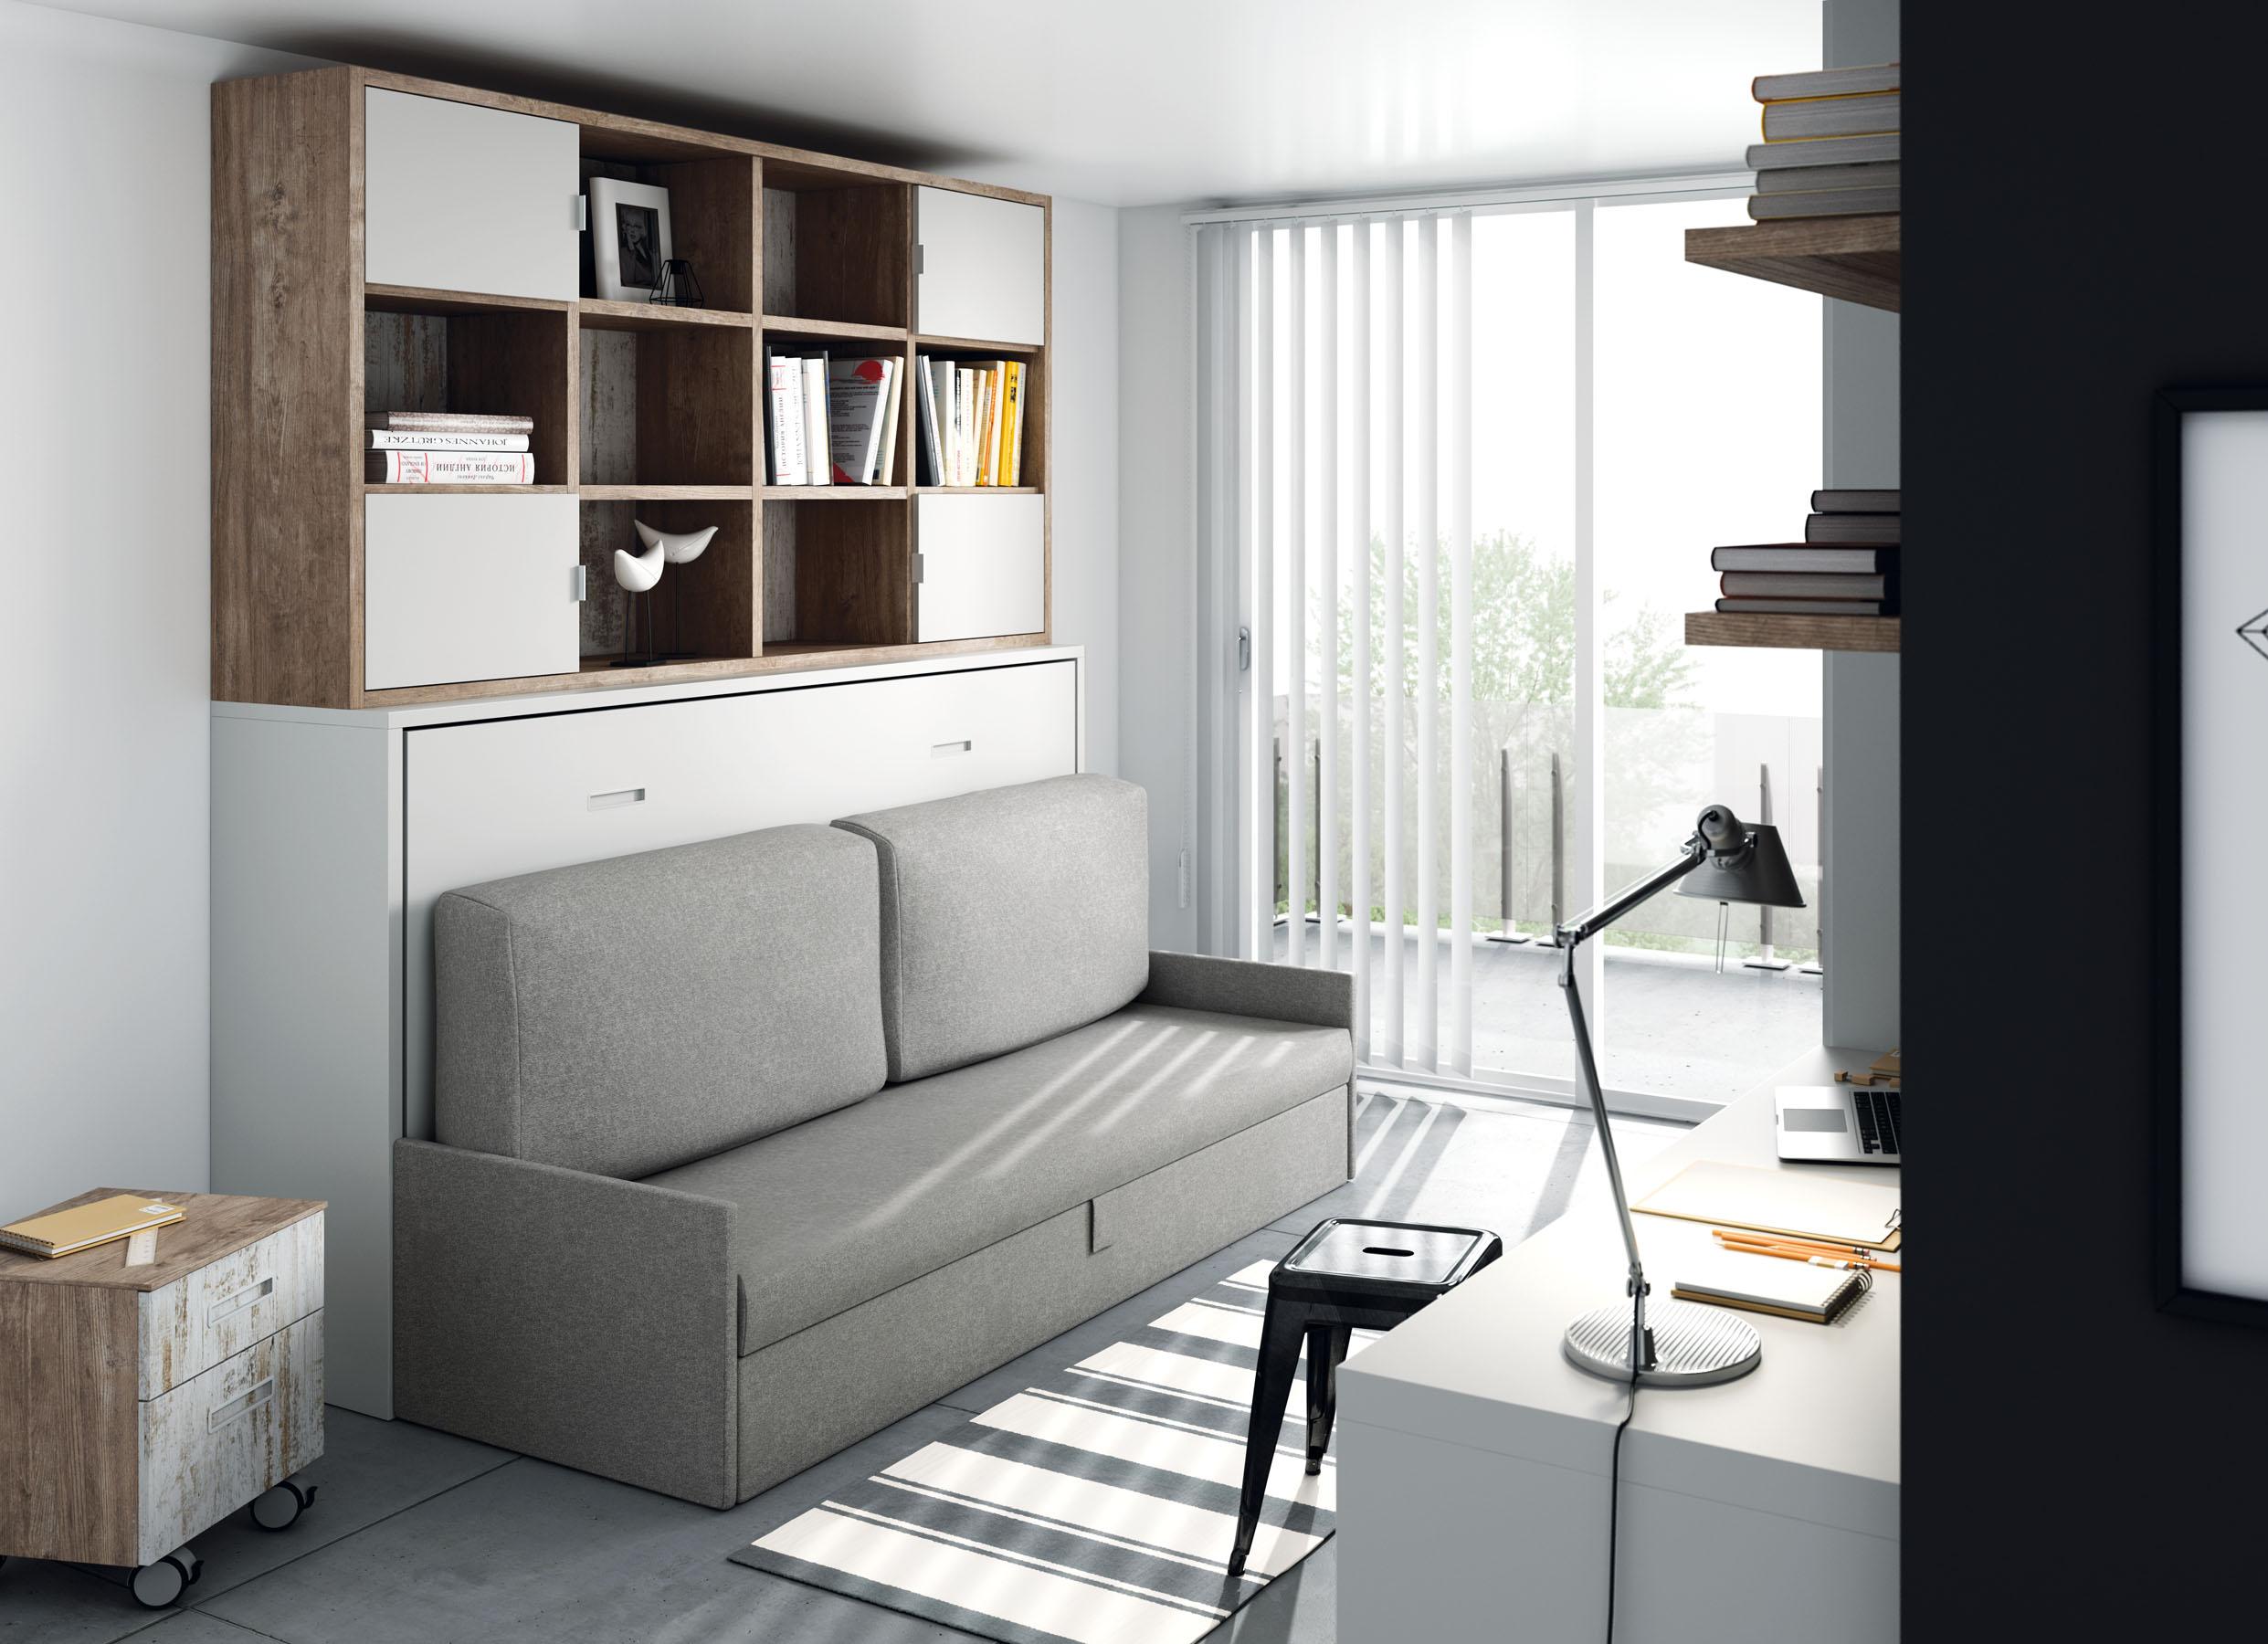 Camas abatibles horizontales con sofa camas abatibles for Sofa cama armario